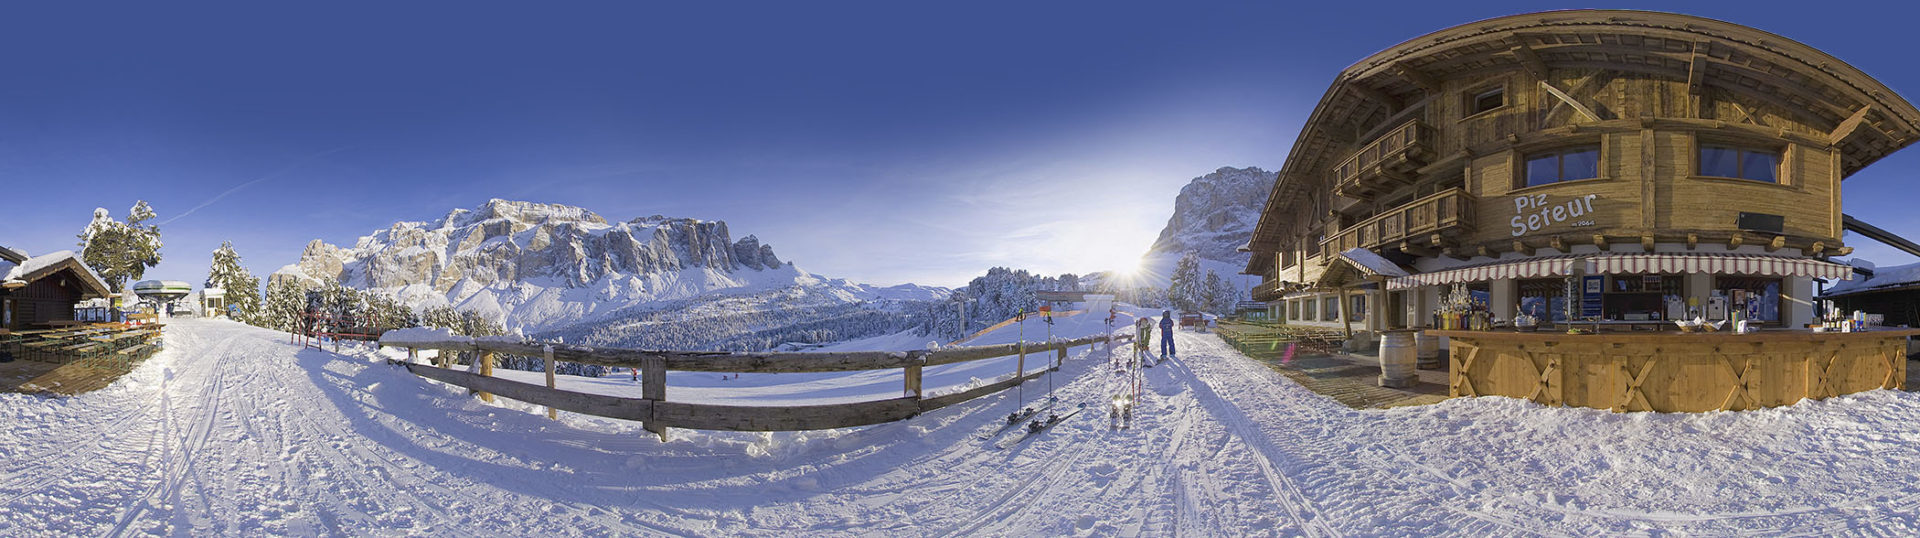 panorama sellaronda blu - Piz Seteur